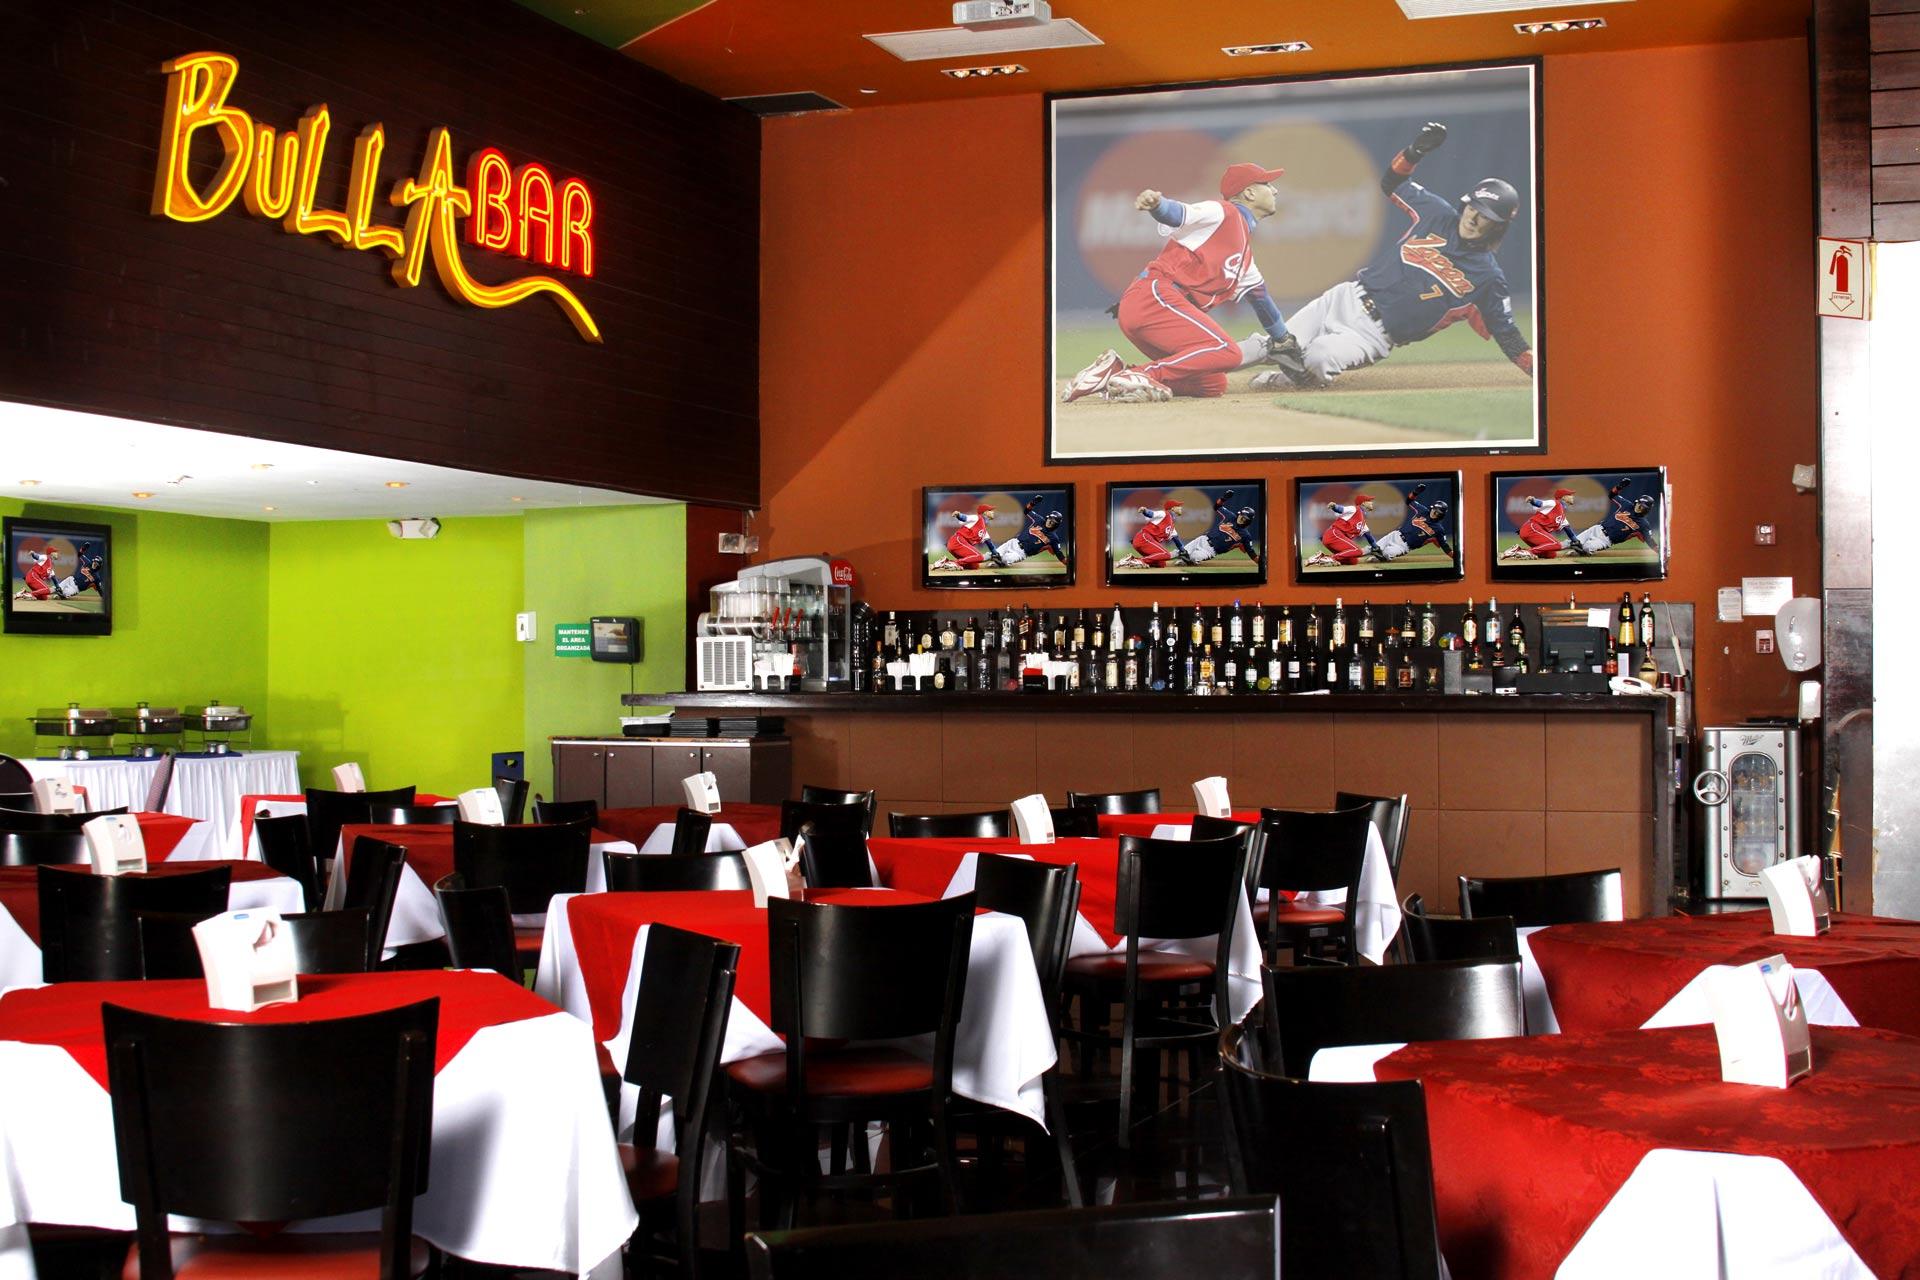 Bulla Bar restaurante Casino Majestic Panama city